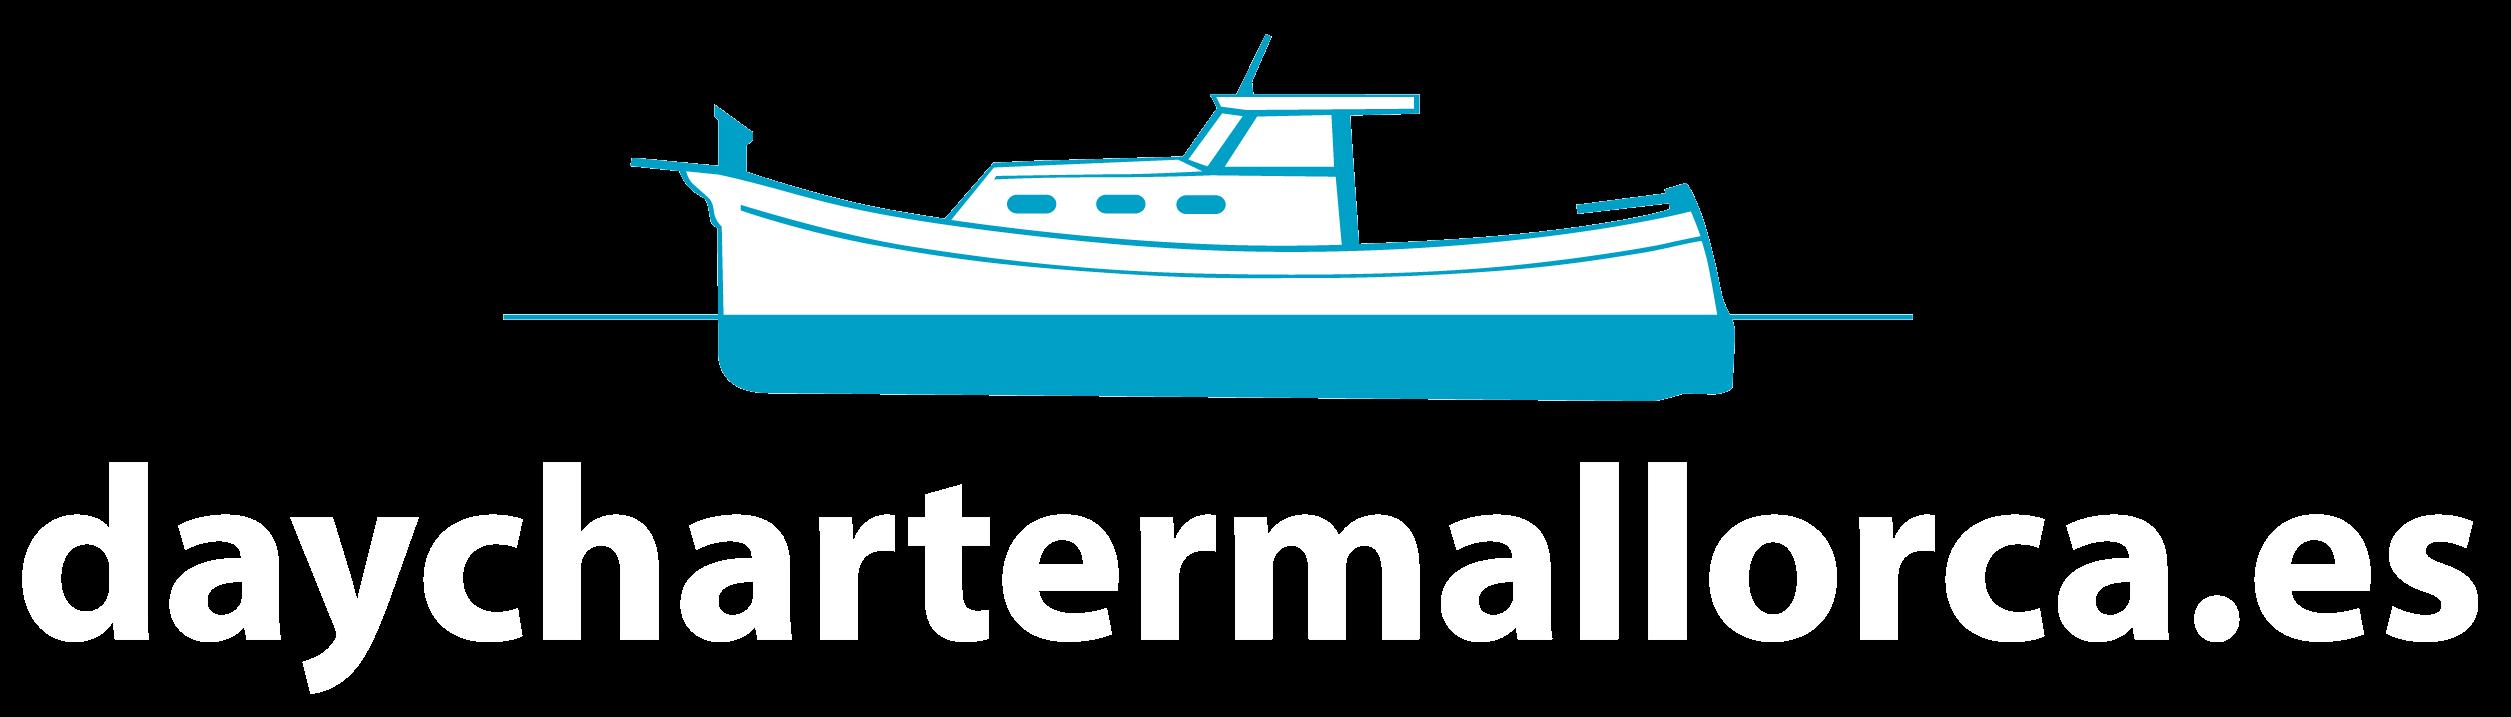 daychartermallorca.es Logo